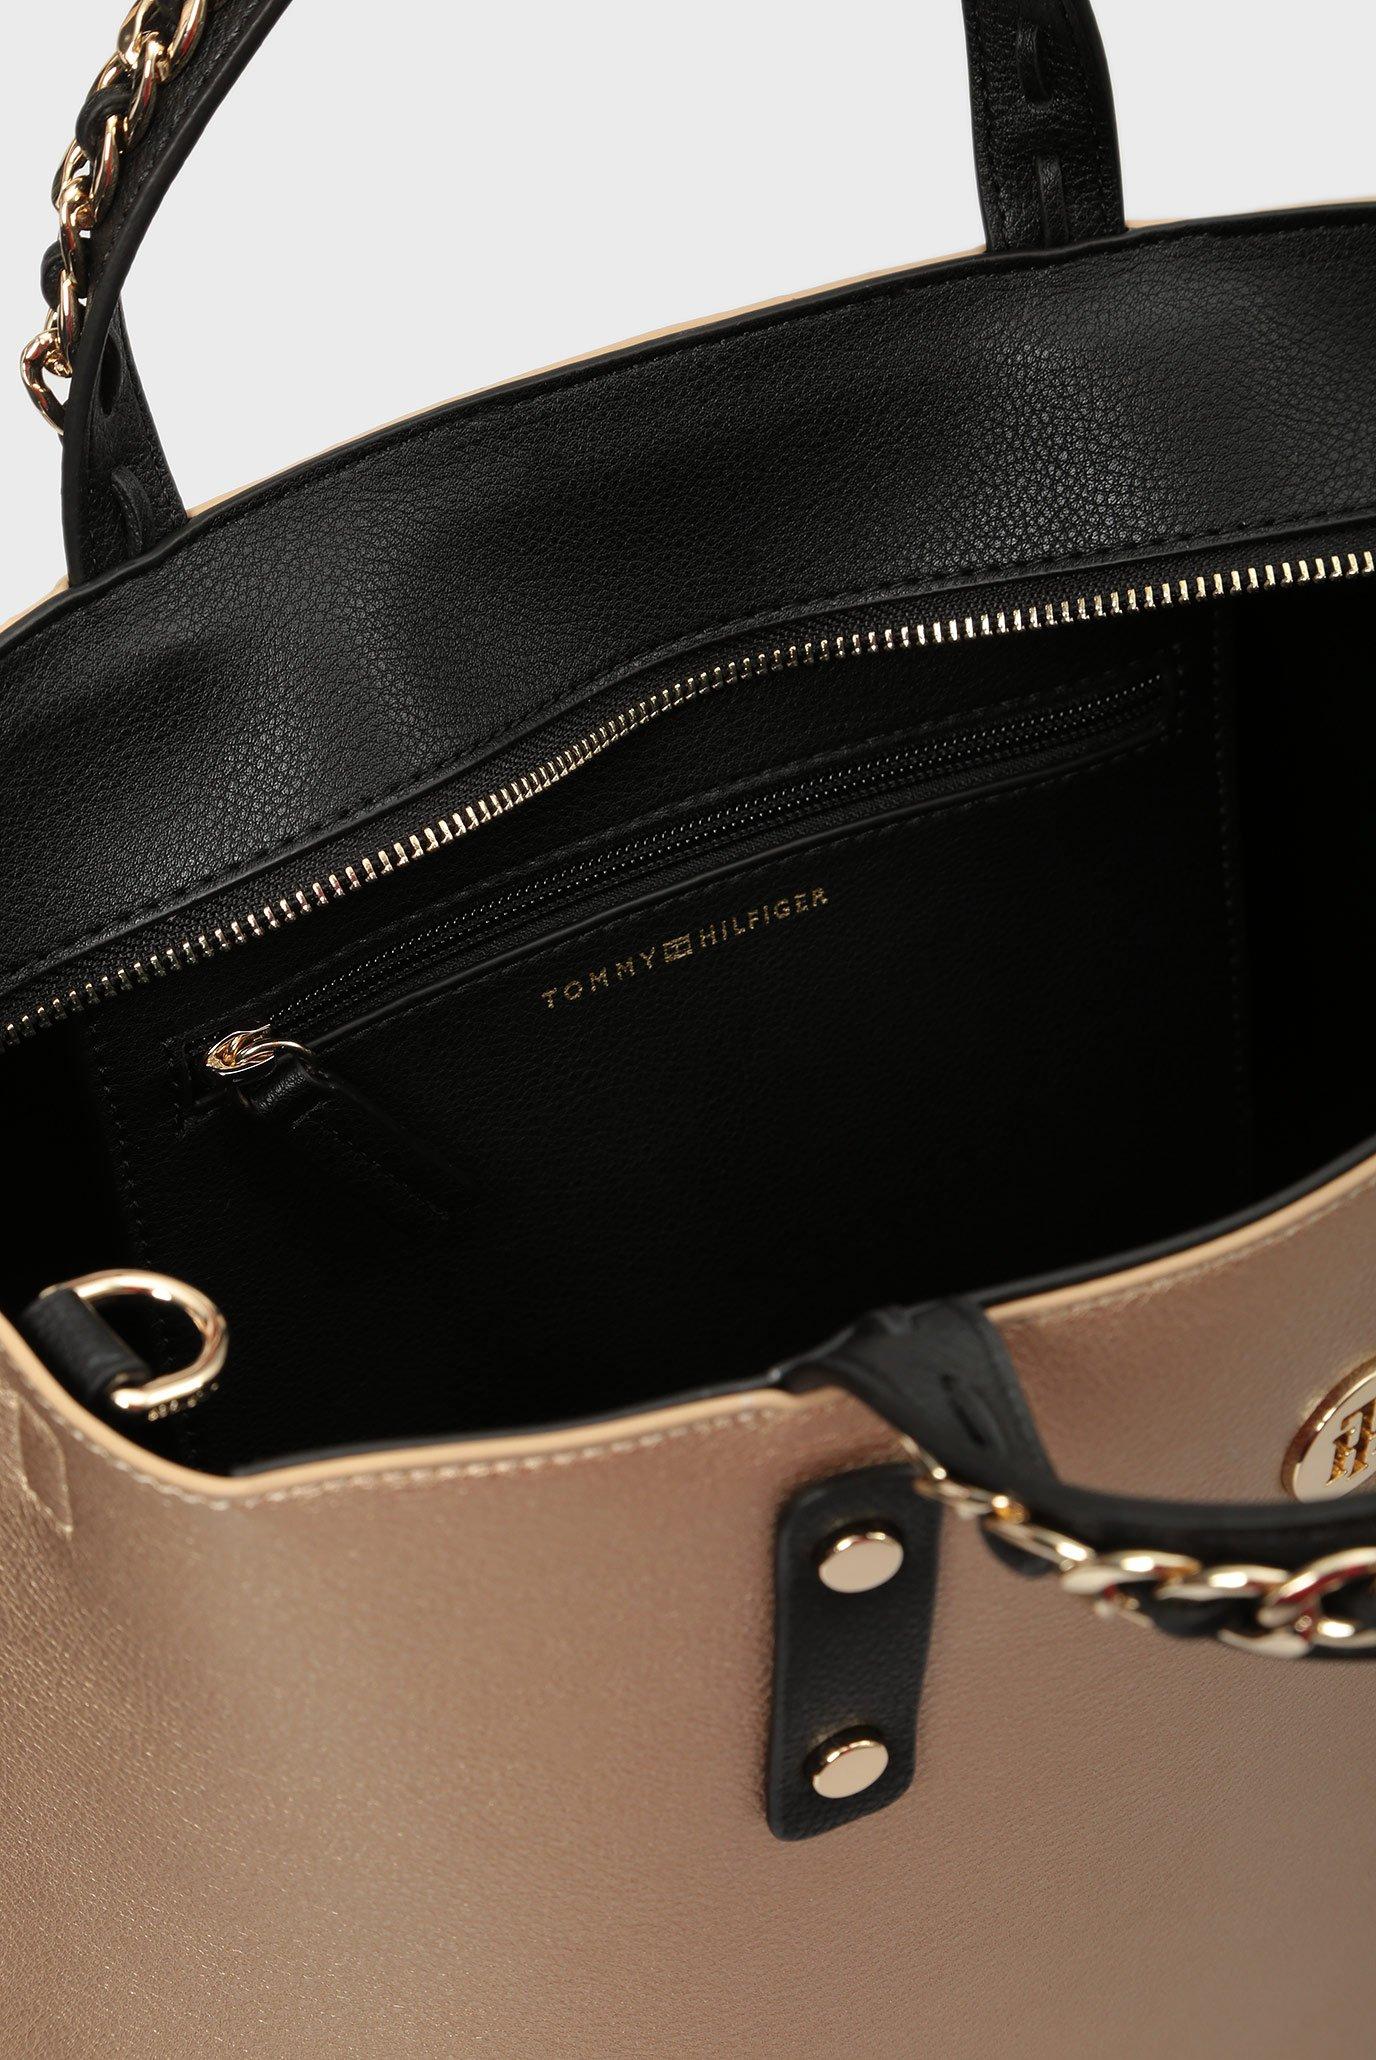 Купить Женская золотистая сумка на плечо TOMMY CHAIN TOTE Tommy Hilfiger Tommy Hilfiger AW0AW05816 – Киев, Украина. Цены в интернет магазине MD Fashion